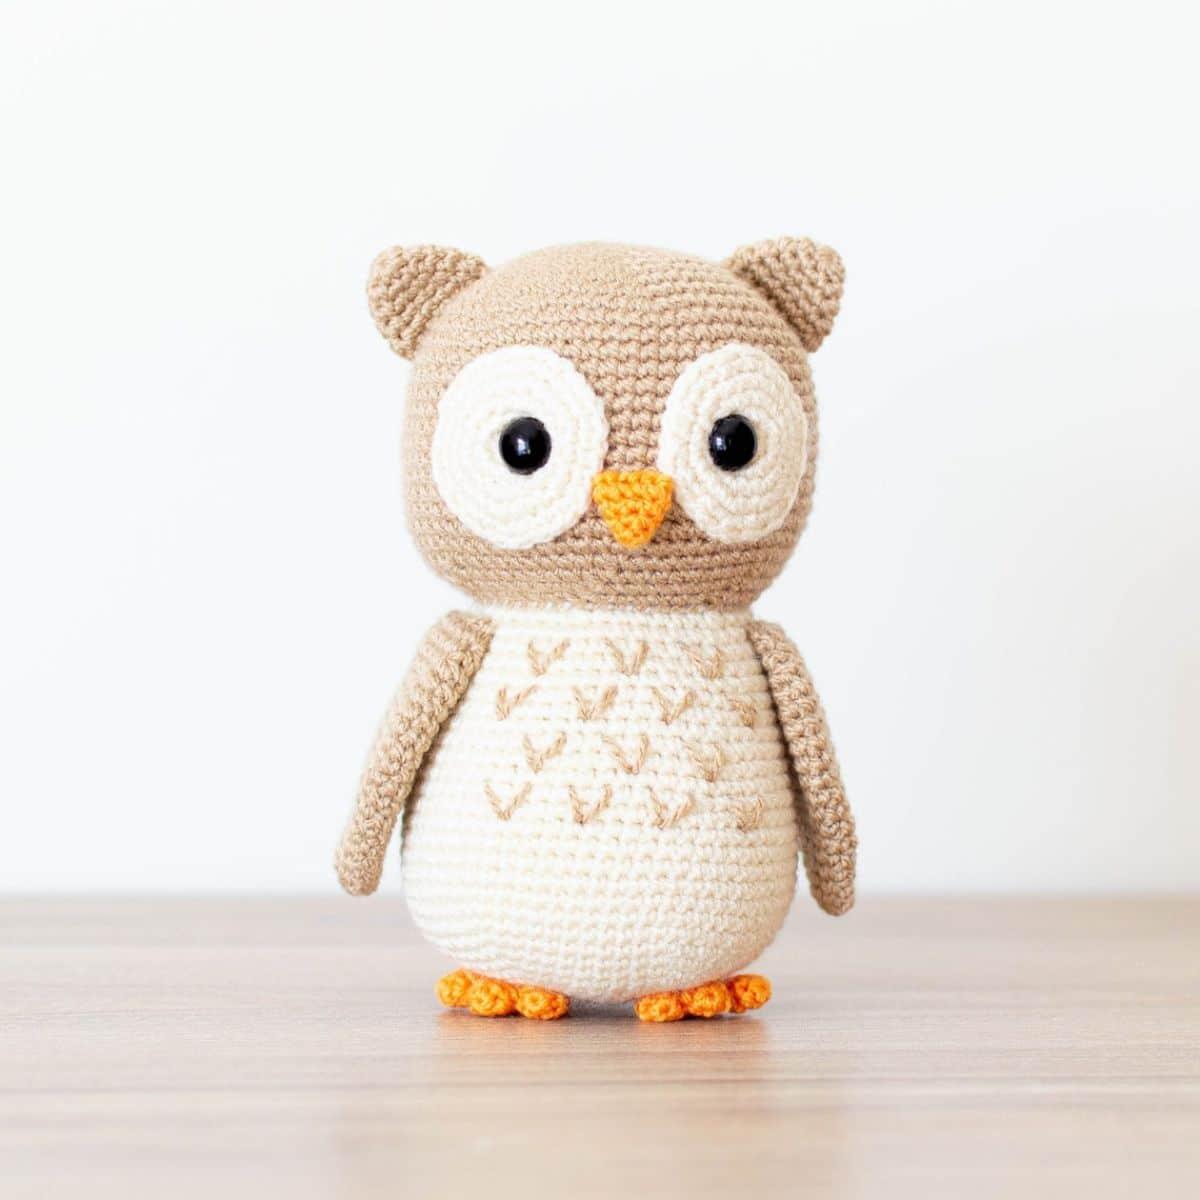 Aldric The Lovely Owl - PDF Amigurumi Crochet Pattern